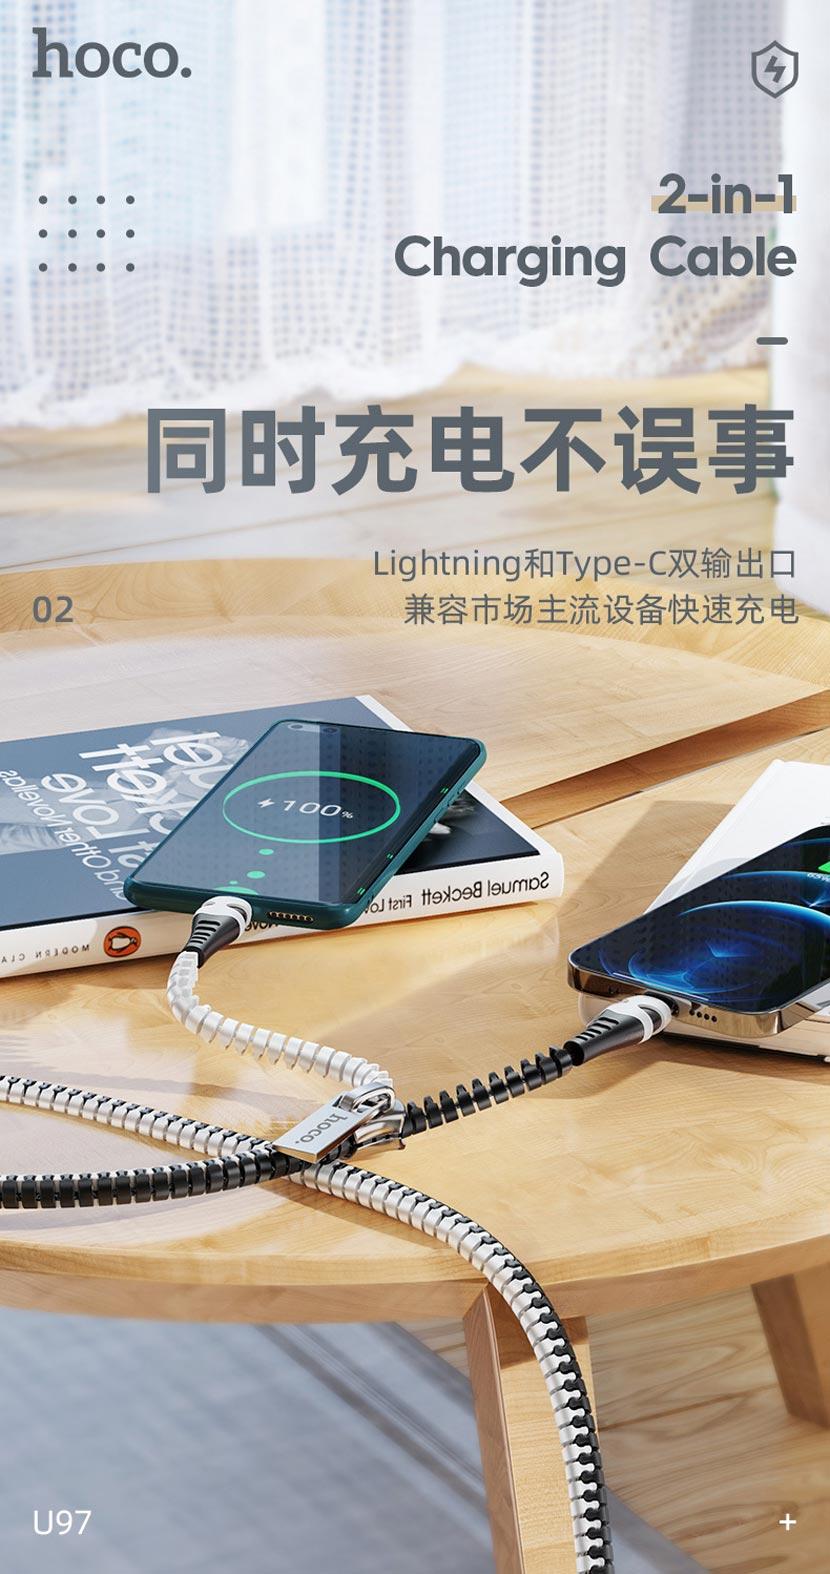 hoco news u97 2in1 zipper charging cable lightning type c charging cn